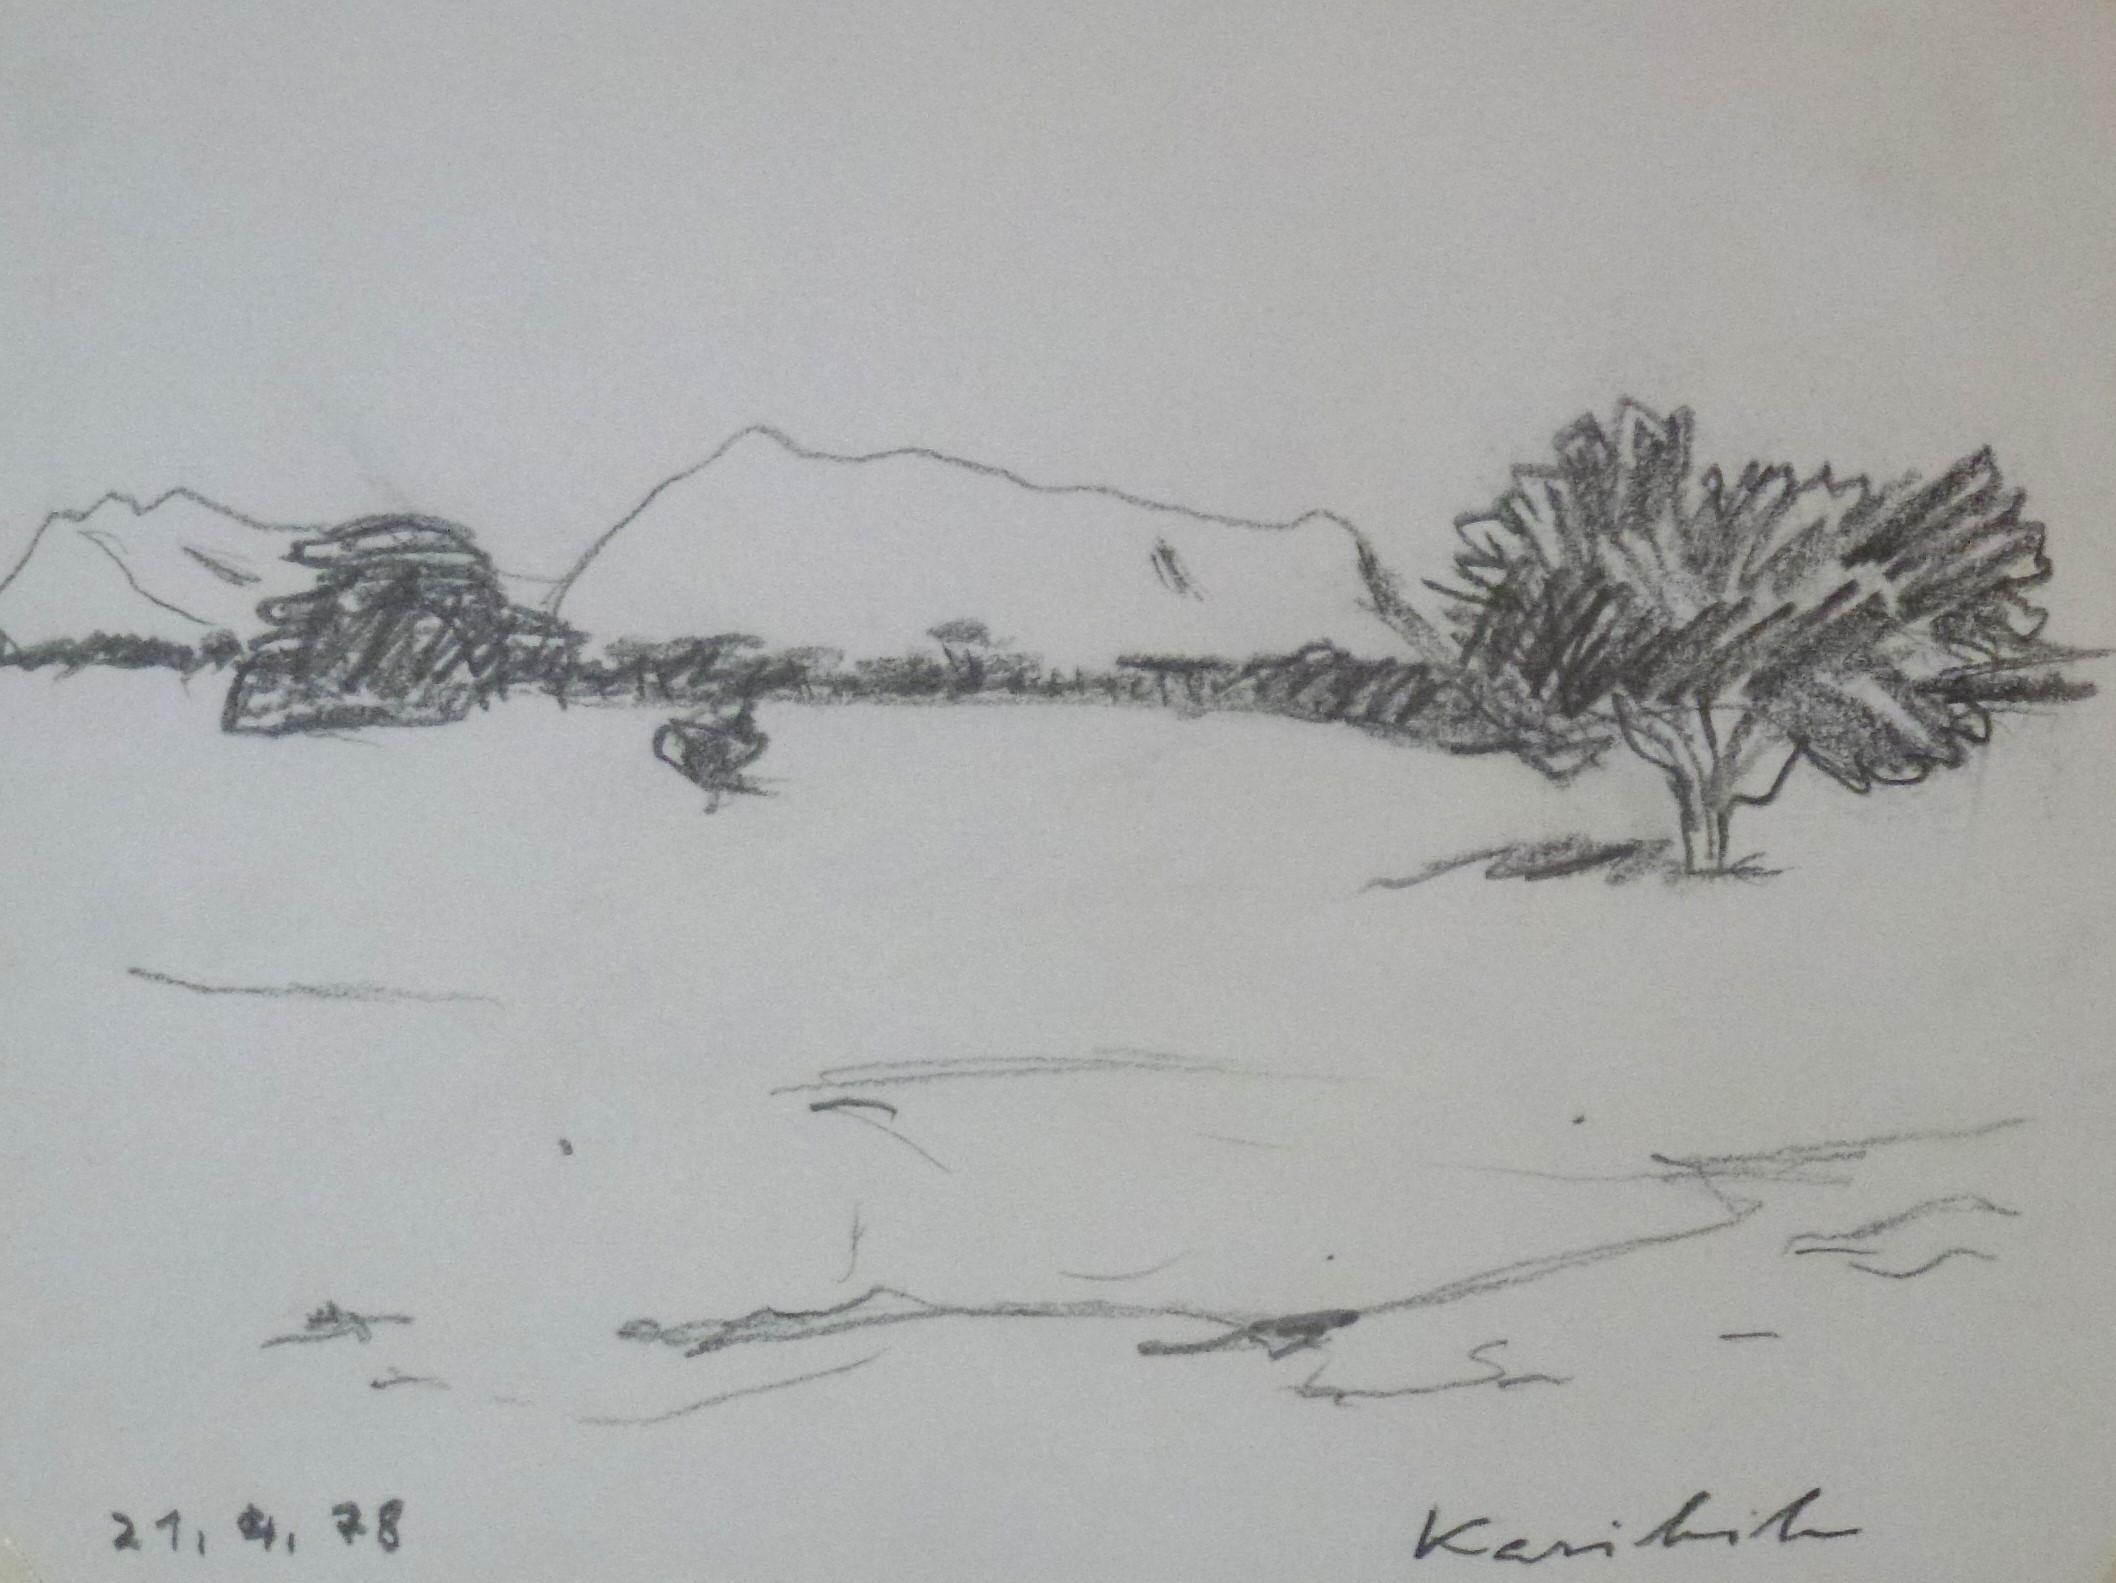 Karibib – April 1978